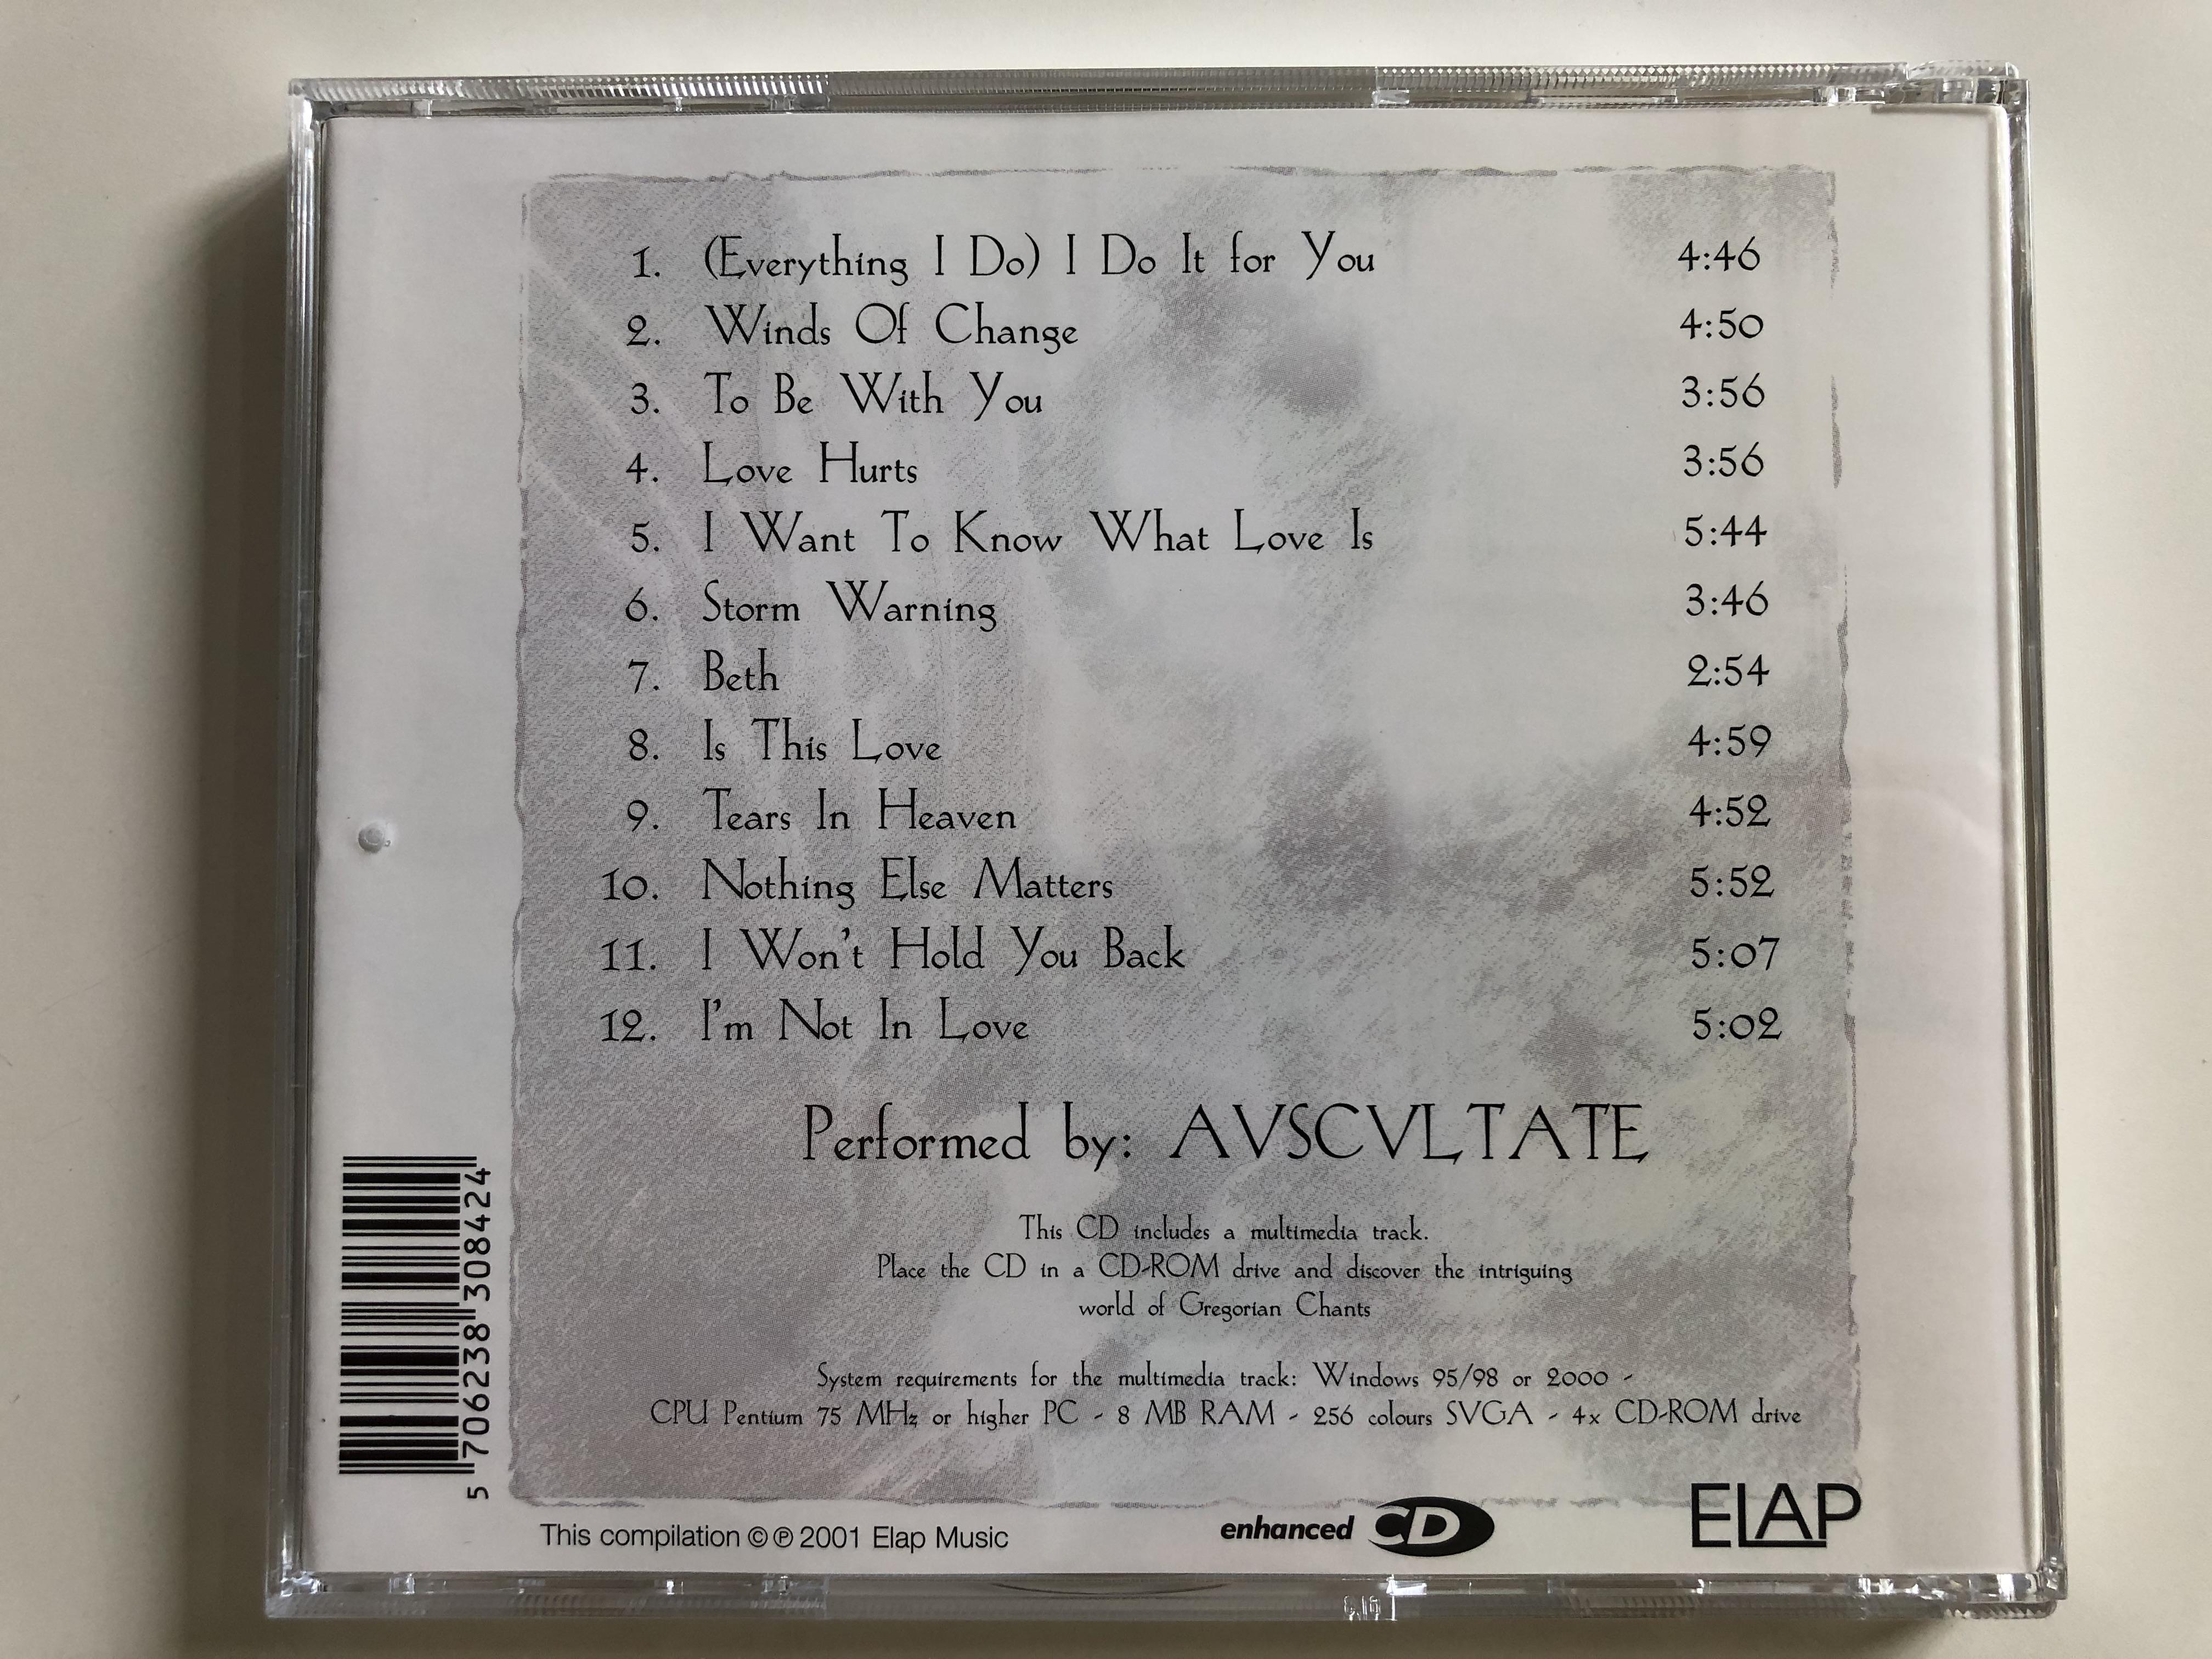 gregorian-chants-rock-ballads-performed-by-avscvltate-enhanced-cd-audio-cd-2001-elap-music-5-.jpg